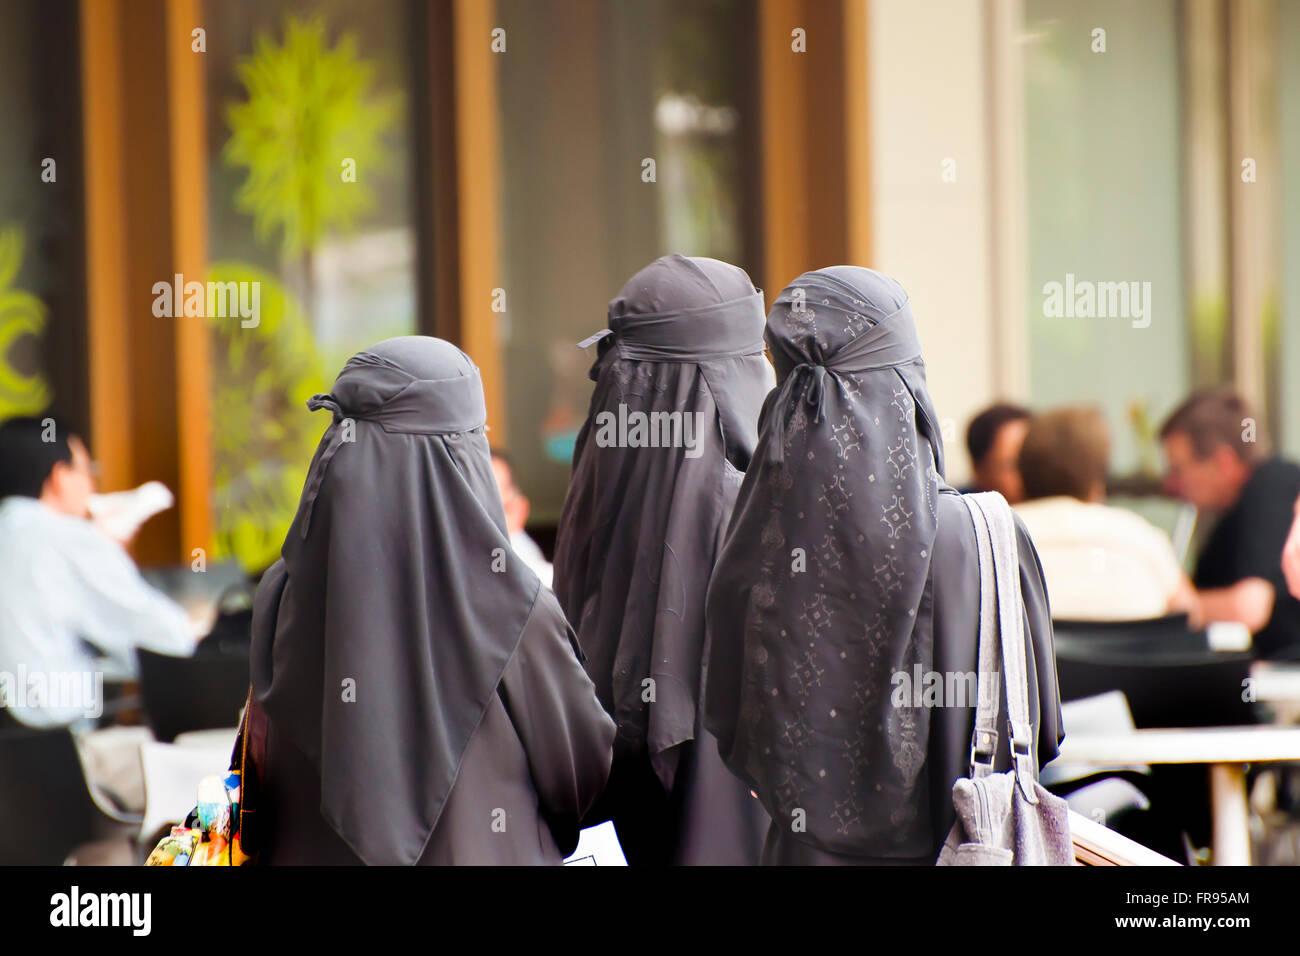 Muslim Women - Malaysia - Stock Image